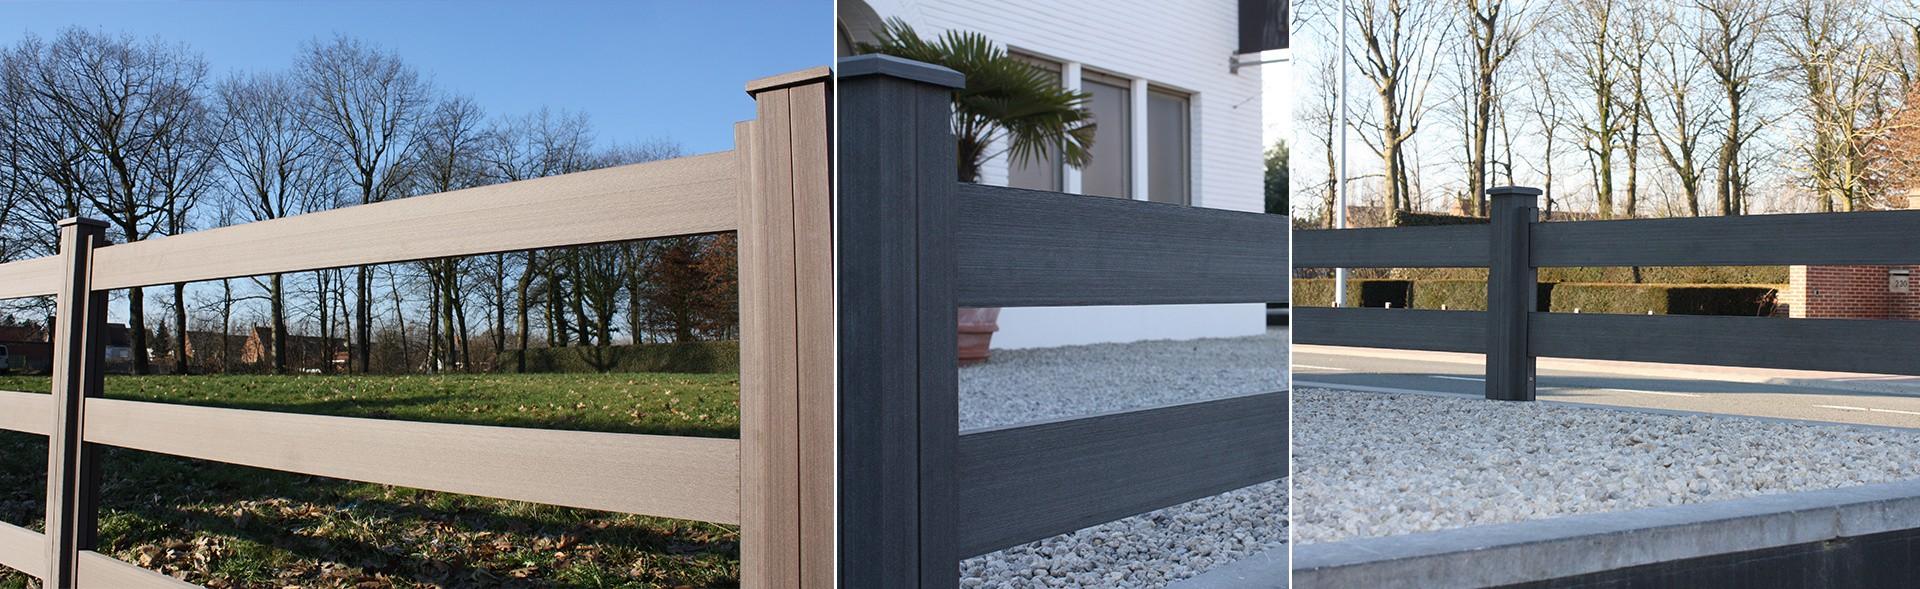 Omheining tuin van houtcomposiet - Duofuse